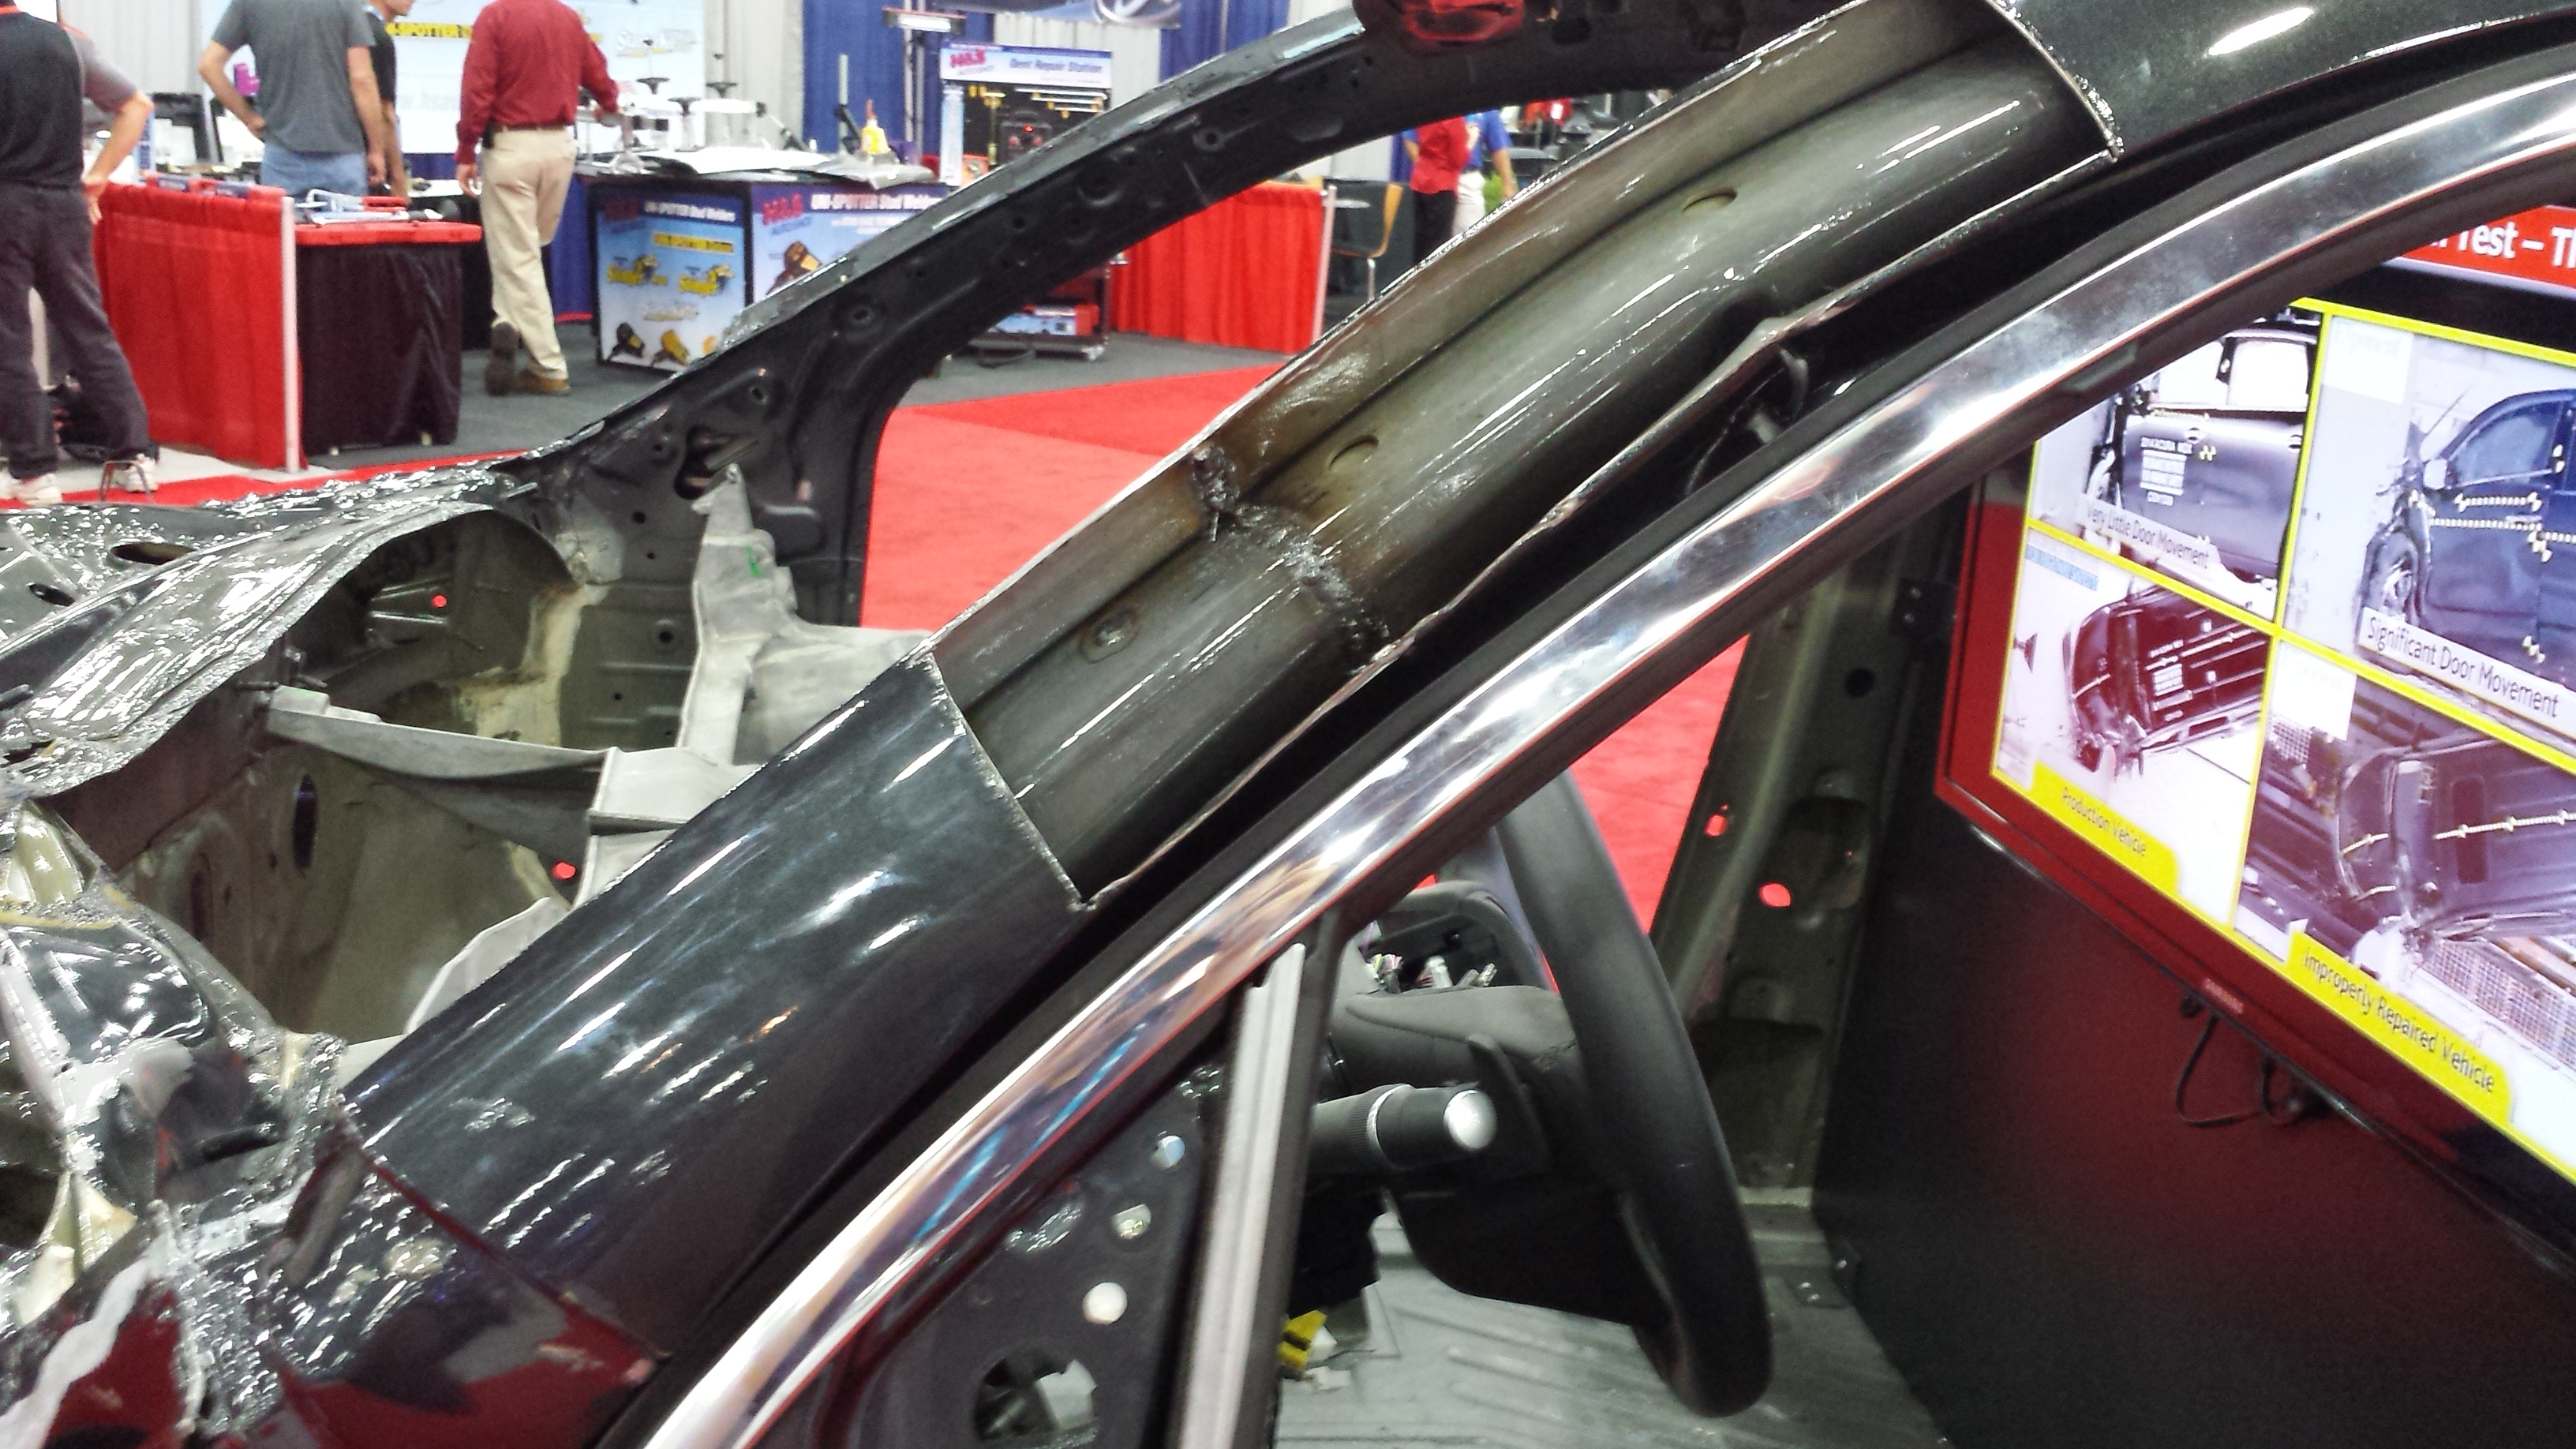 insurance jackson garage liability adobestock florida barbee keepers